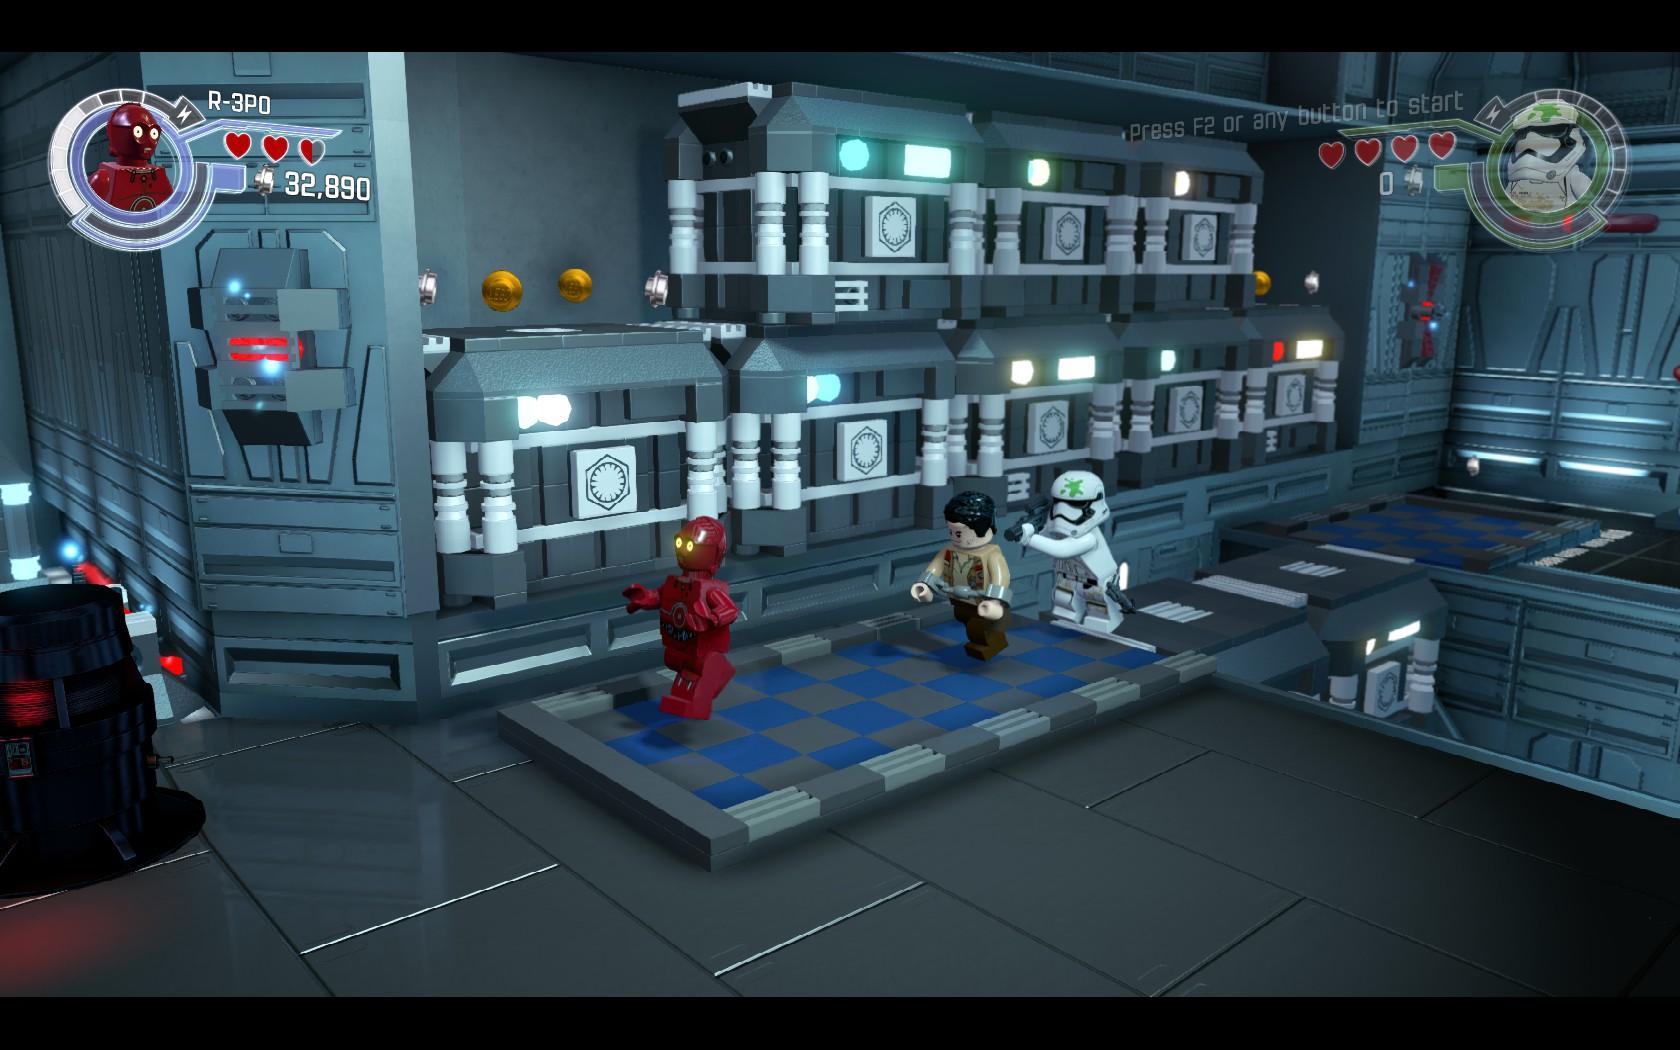 LEGO Star Wars: The Force Awakens - kostky se probouzí 126752